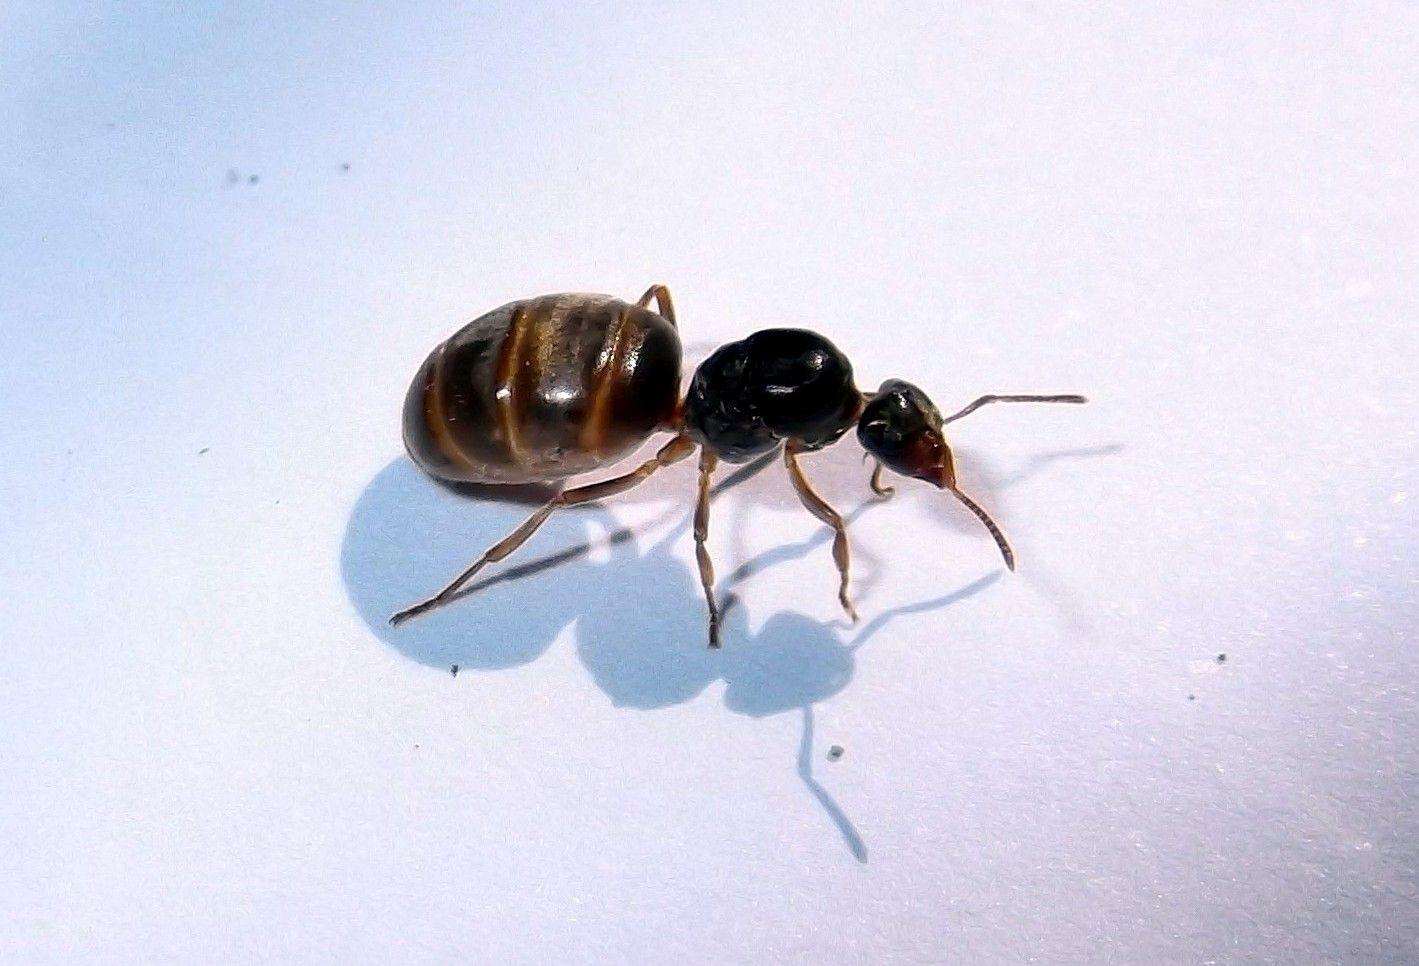 Królowa mrówek Lasius flavus